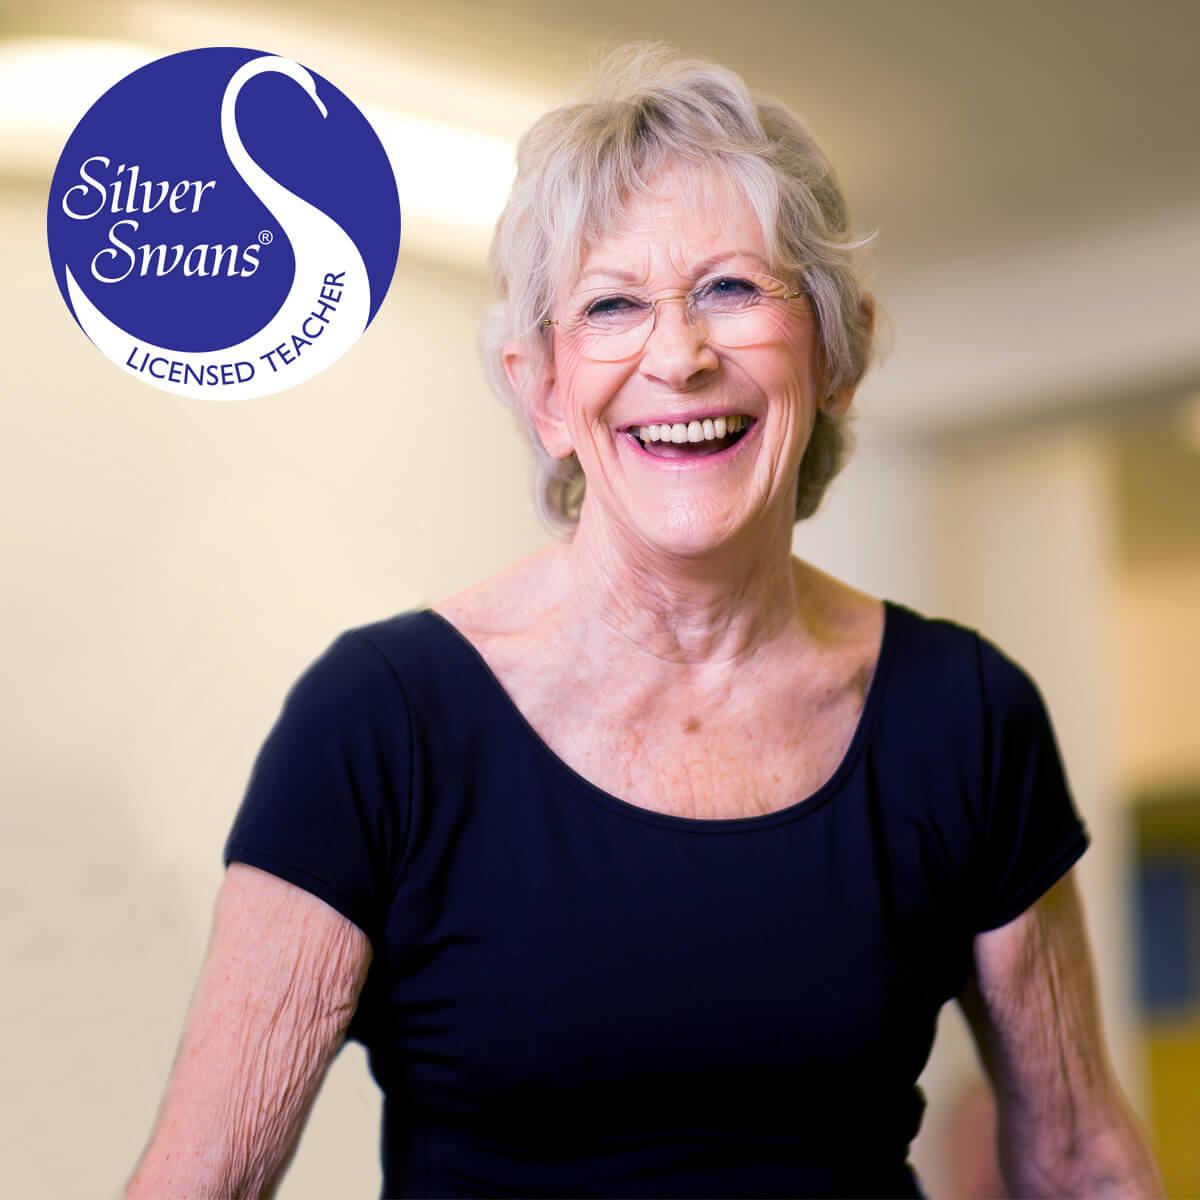 Silver-Swans-RAD-lady-happy-ballet-smiling-UK-RNSD.jpg